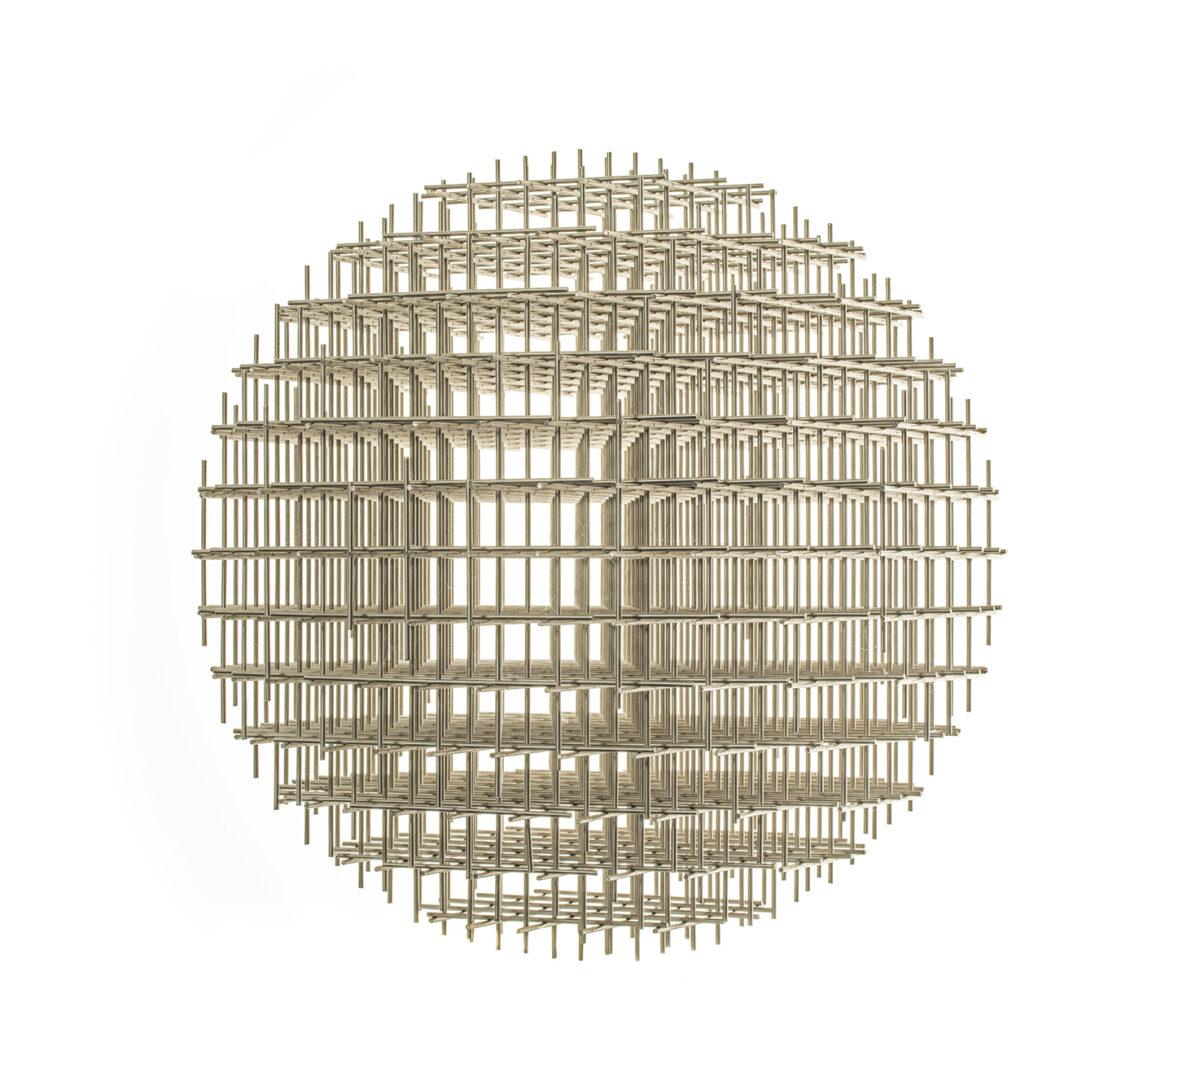 François Morellet Sphere Trame stainless steel sculpture